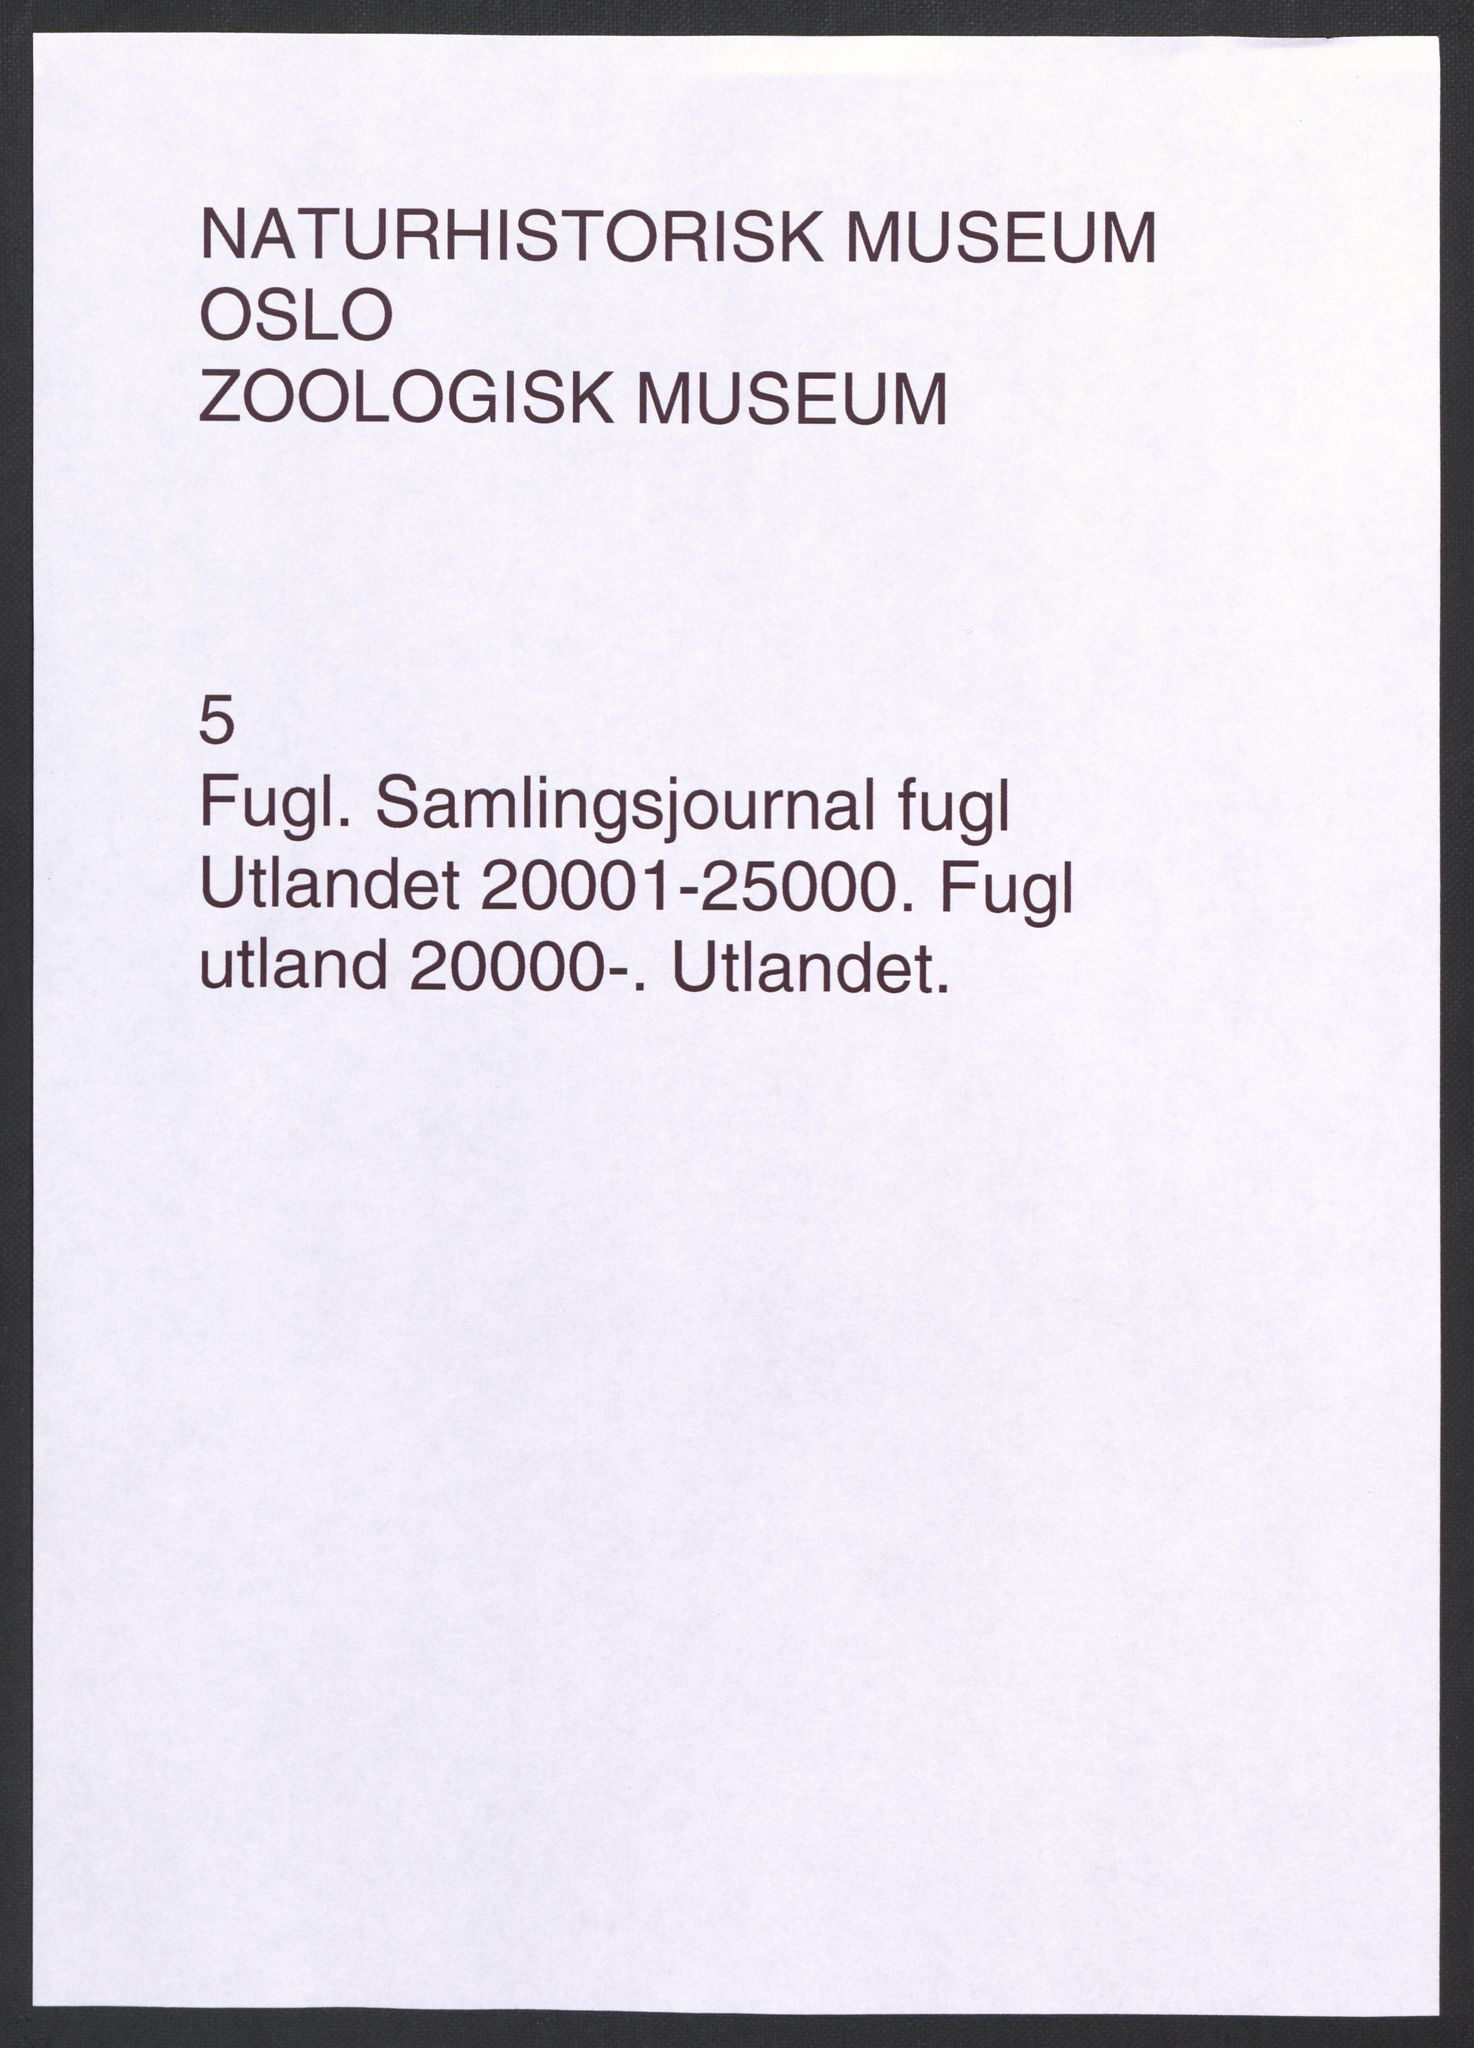 NHMO, Naturhistorisk museum (Oslo), 2: Fugl. Samlingsjournal. Fuglesamlingen, Skinnsamling Utlandet (L), nr. 20001-25000.